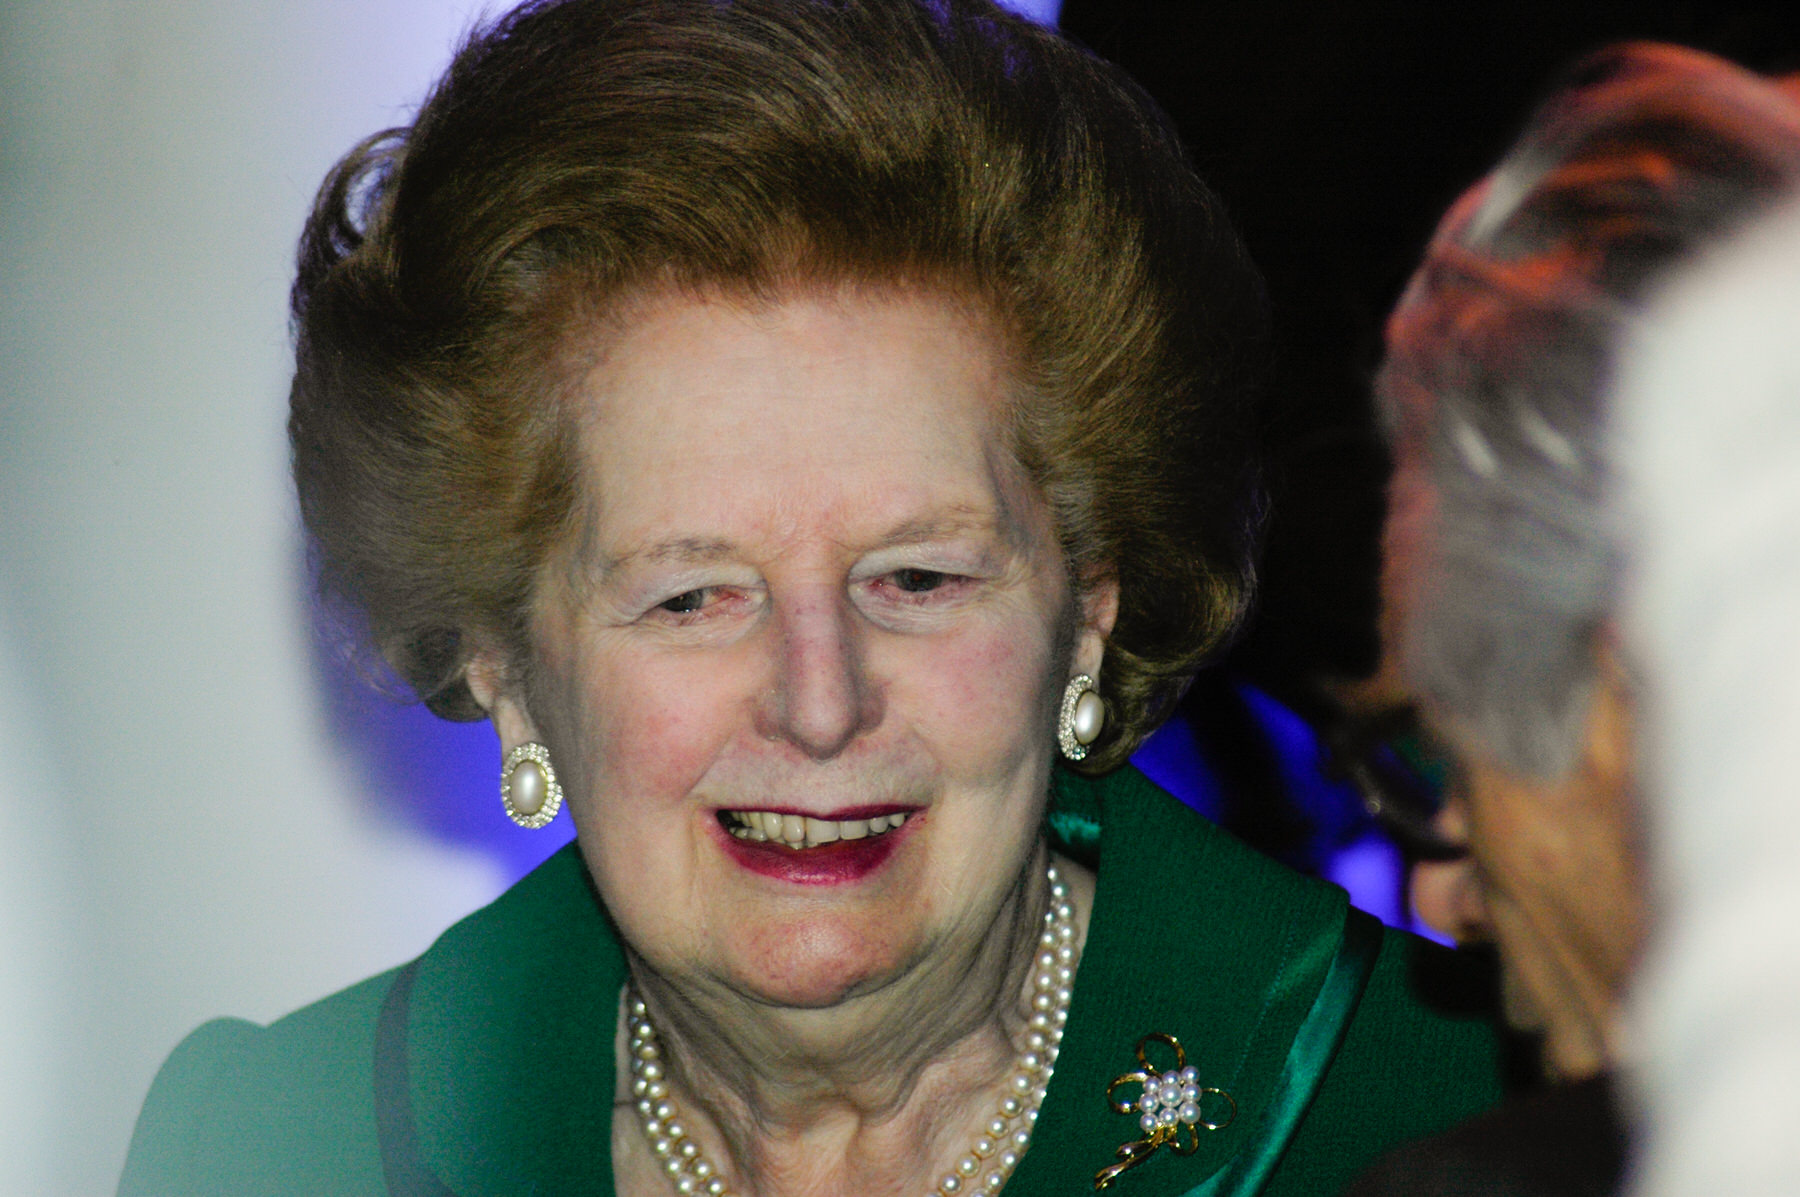 13-Dame Vera Lynn 90th birthday Imperial war Museum Margaret Thatcher.jpg